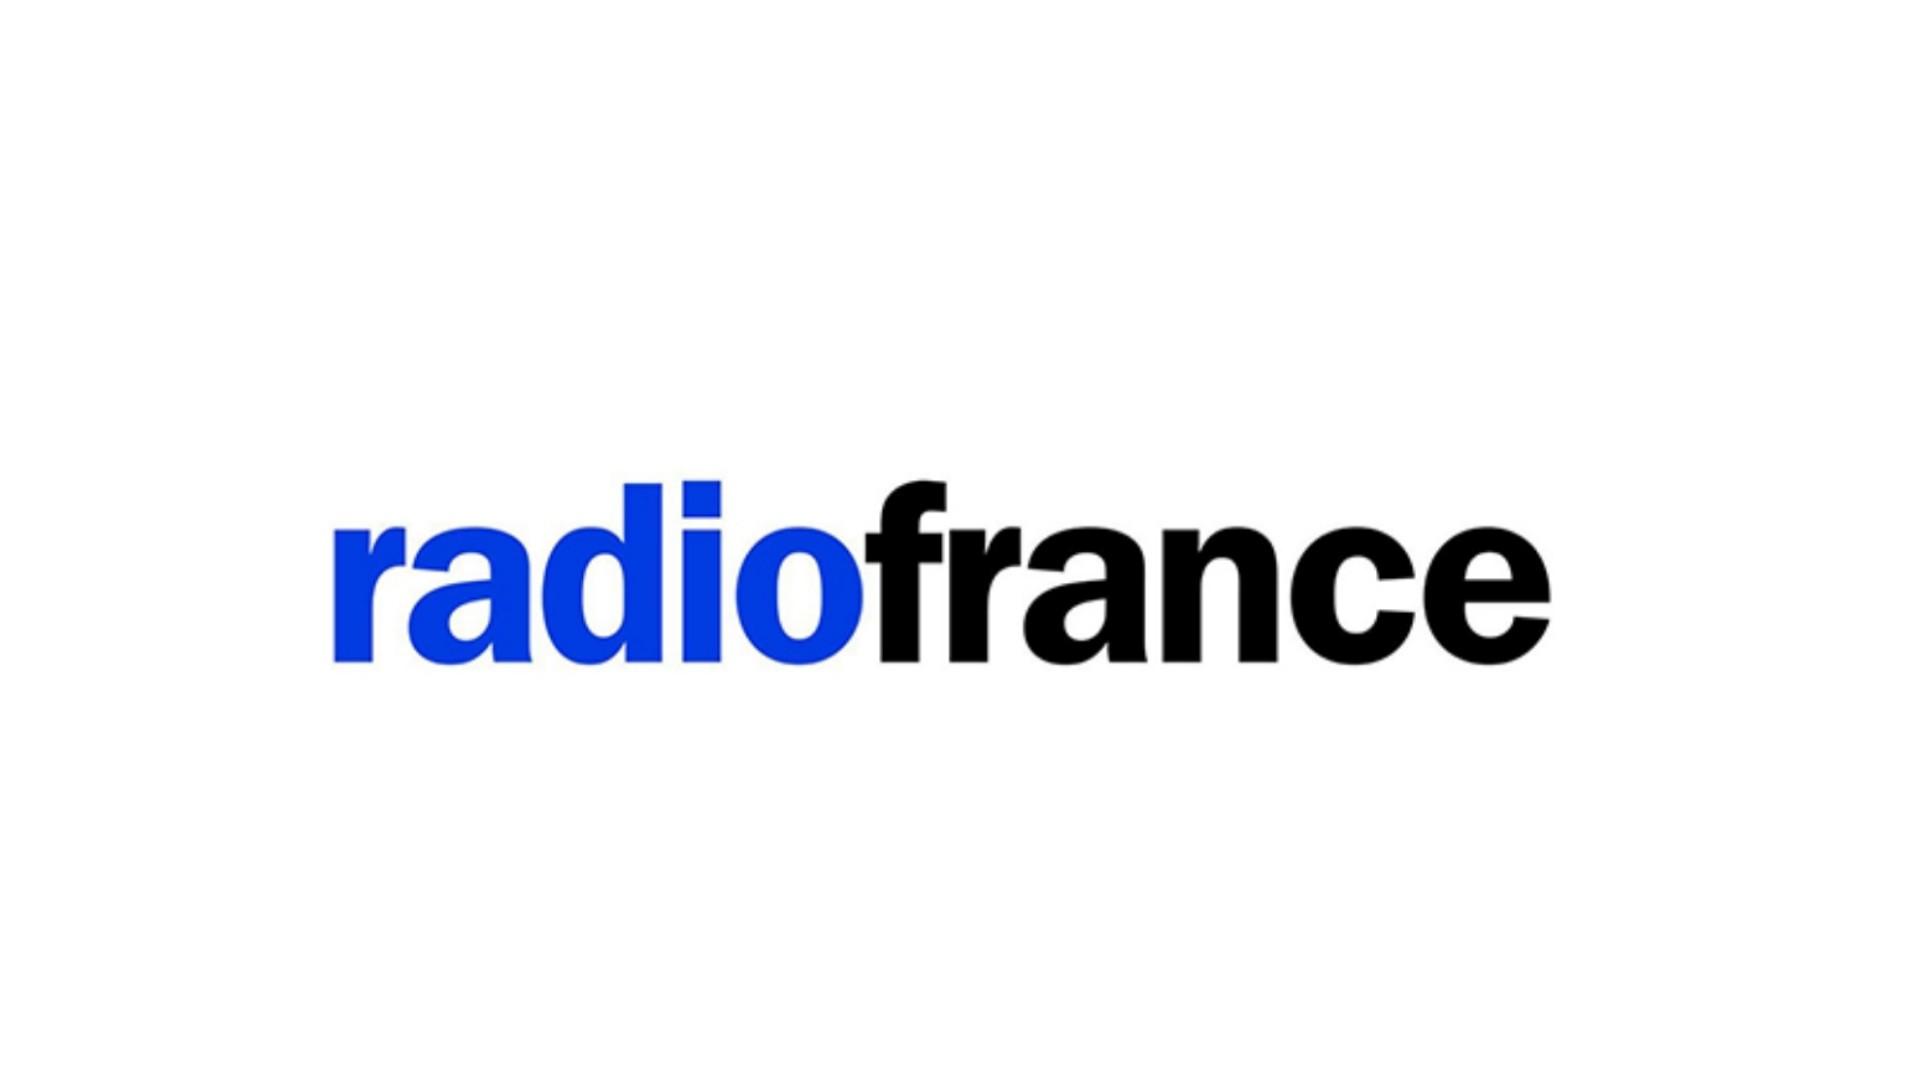 Radio France (1) logo